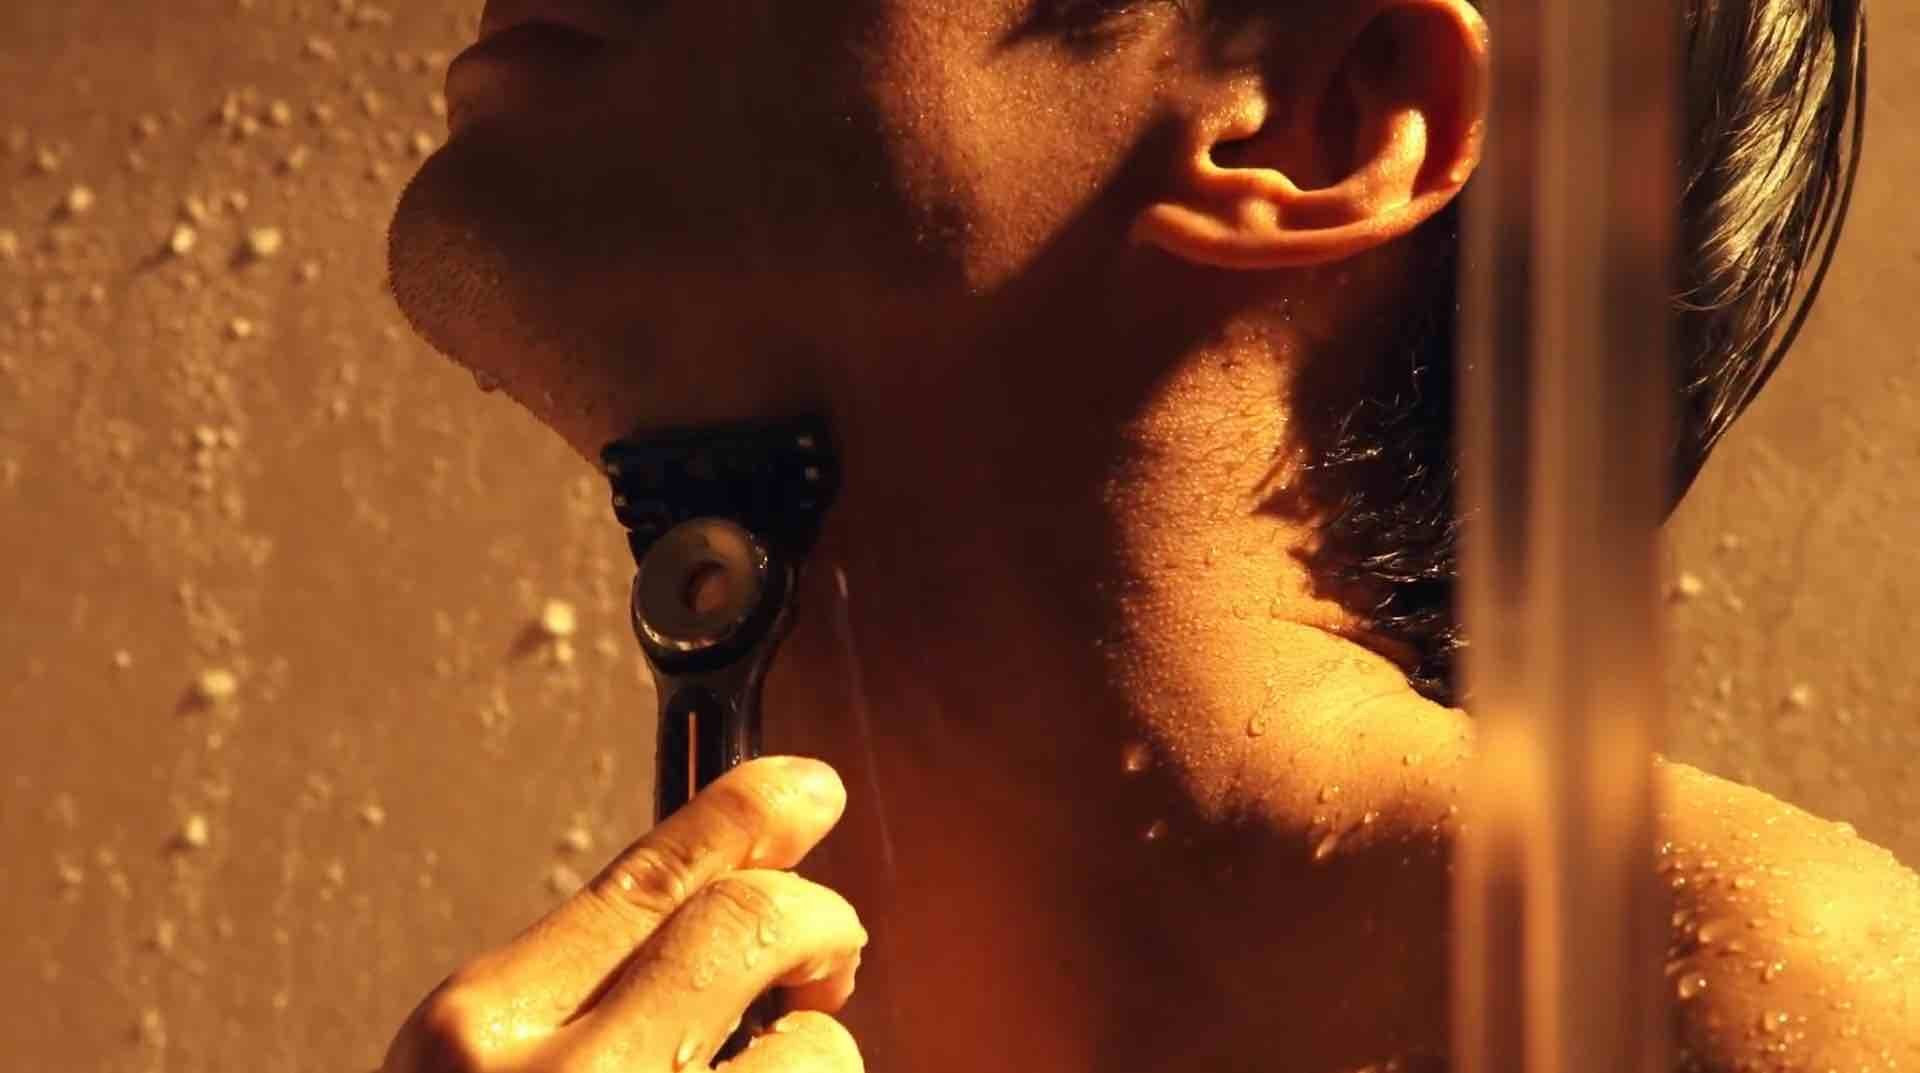 gillettelabs-heated-razor-shower-waterproof